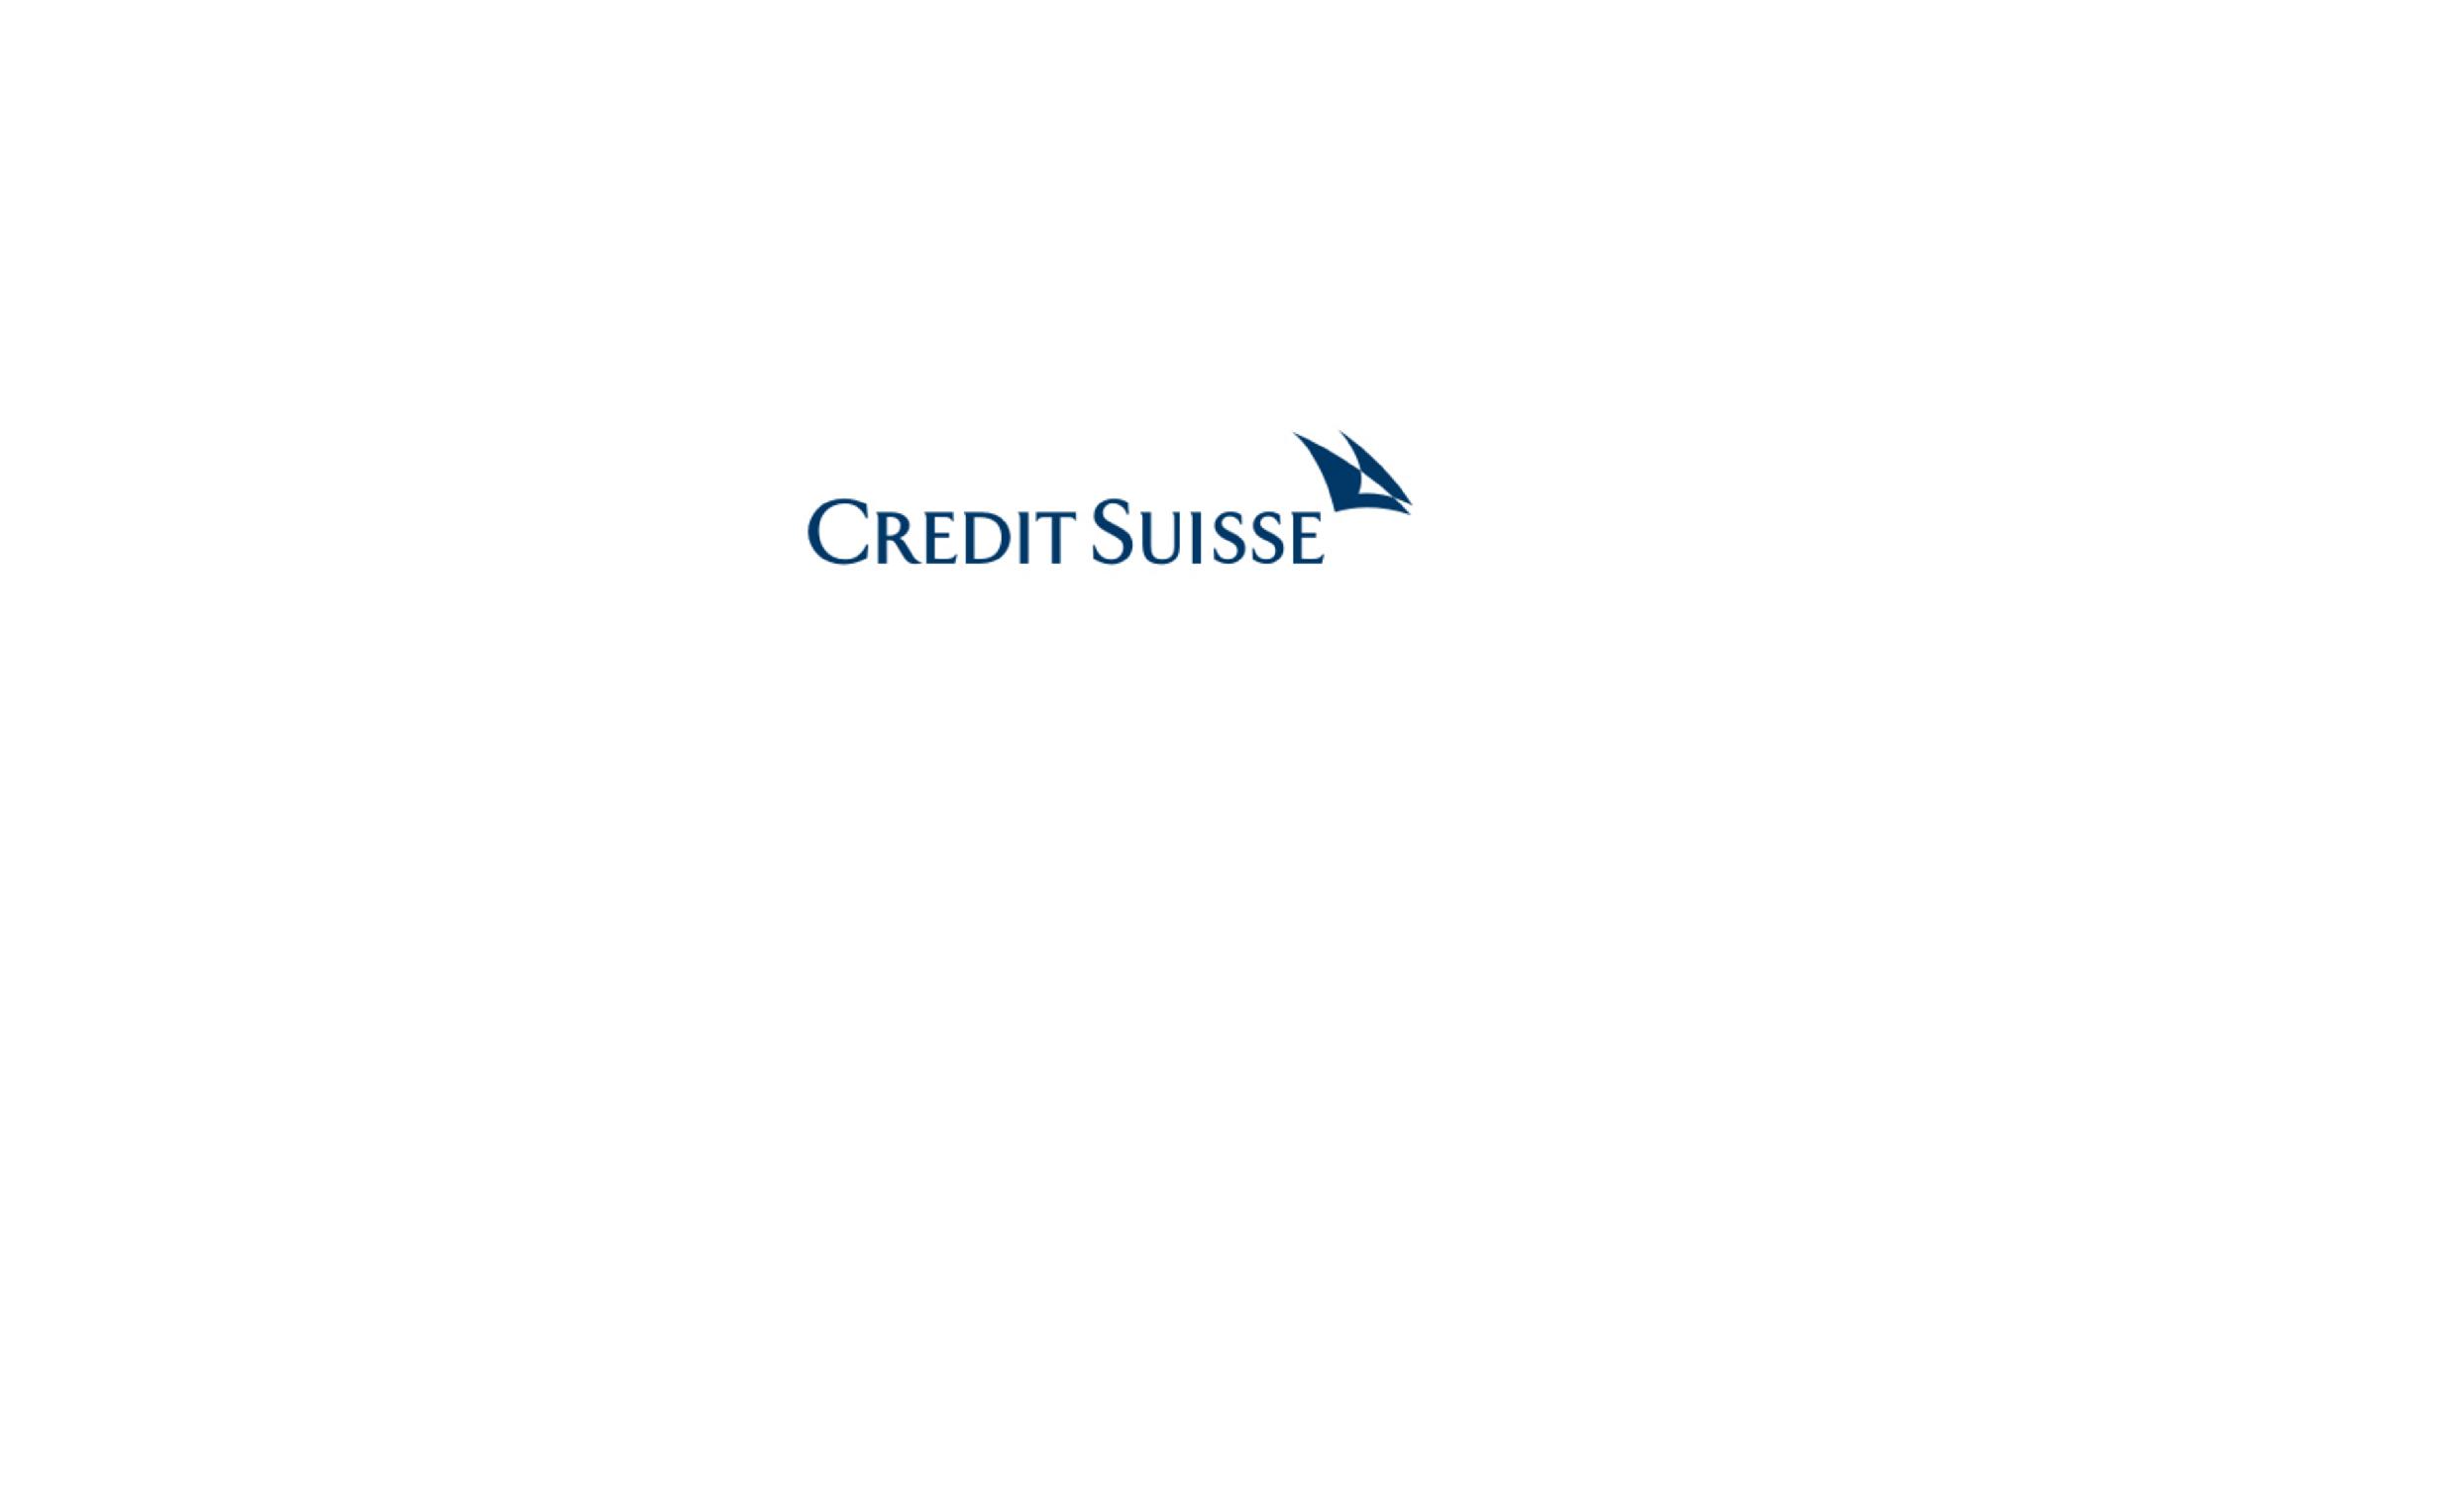 Credit Suisse Logo PNG-PlusPNG.com-2487 - Credit Suisse Logo PNG